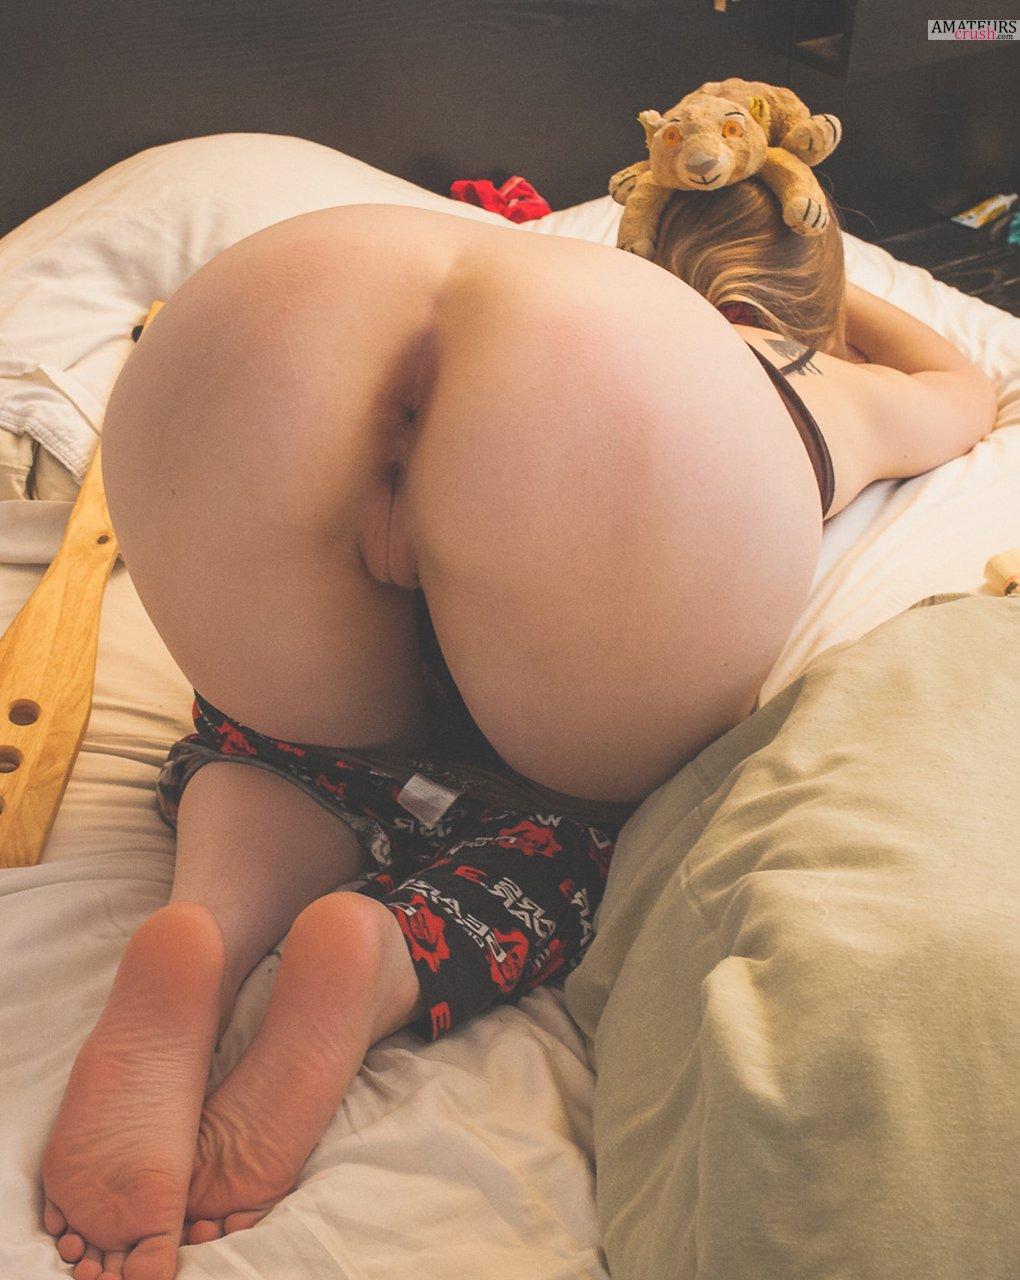 Nude Women Bent Over Collection Part Ii Amateurscrush Com